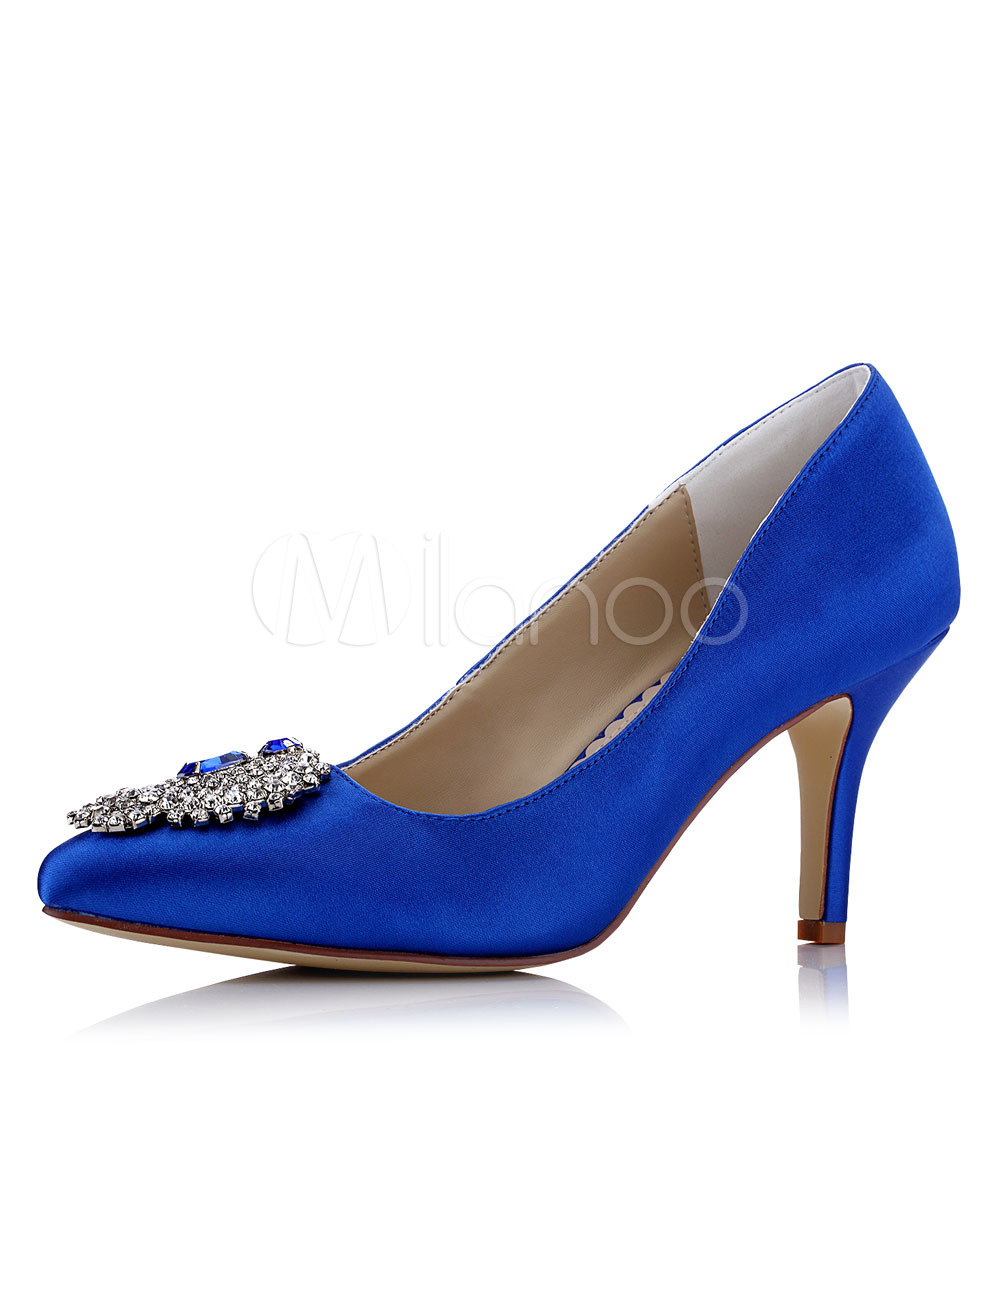 Blue Wedding Shoes Satin High Heel Pointed Toe Rhinestones Beaded Slip On Bridal Pumps